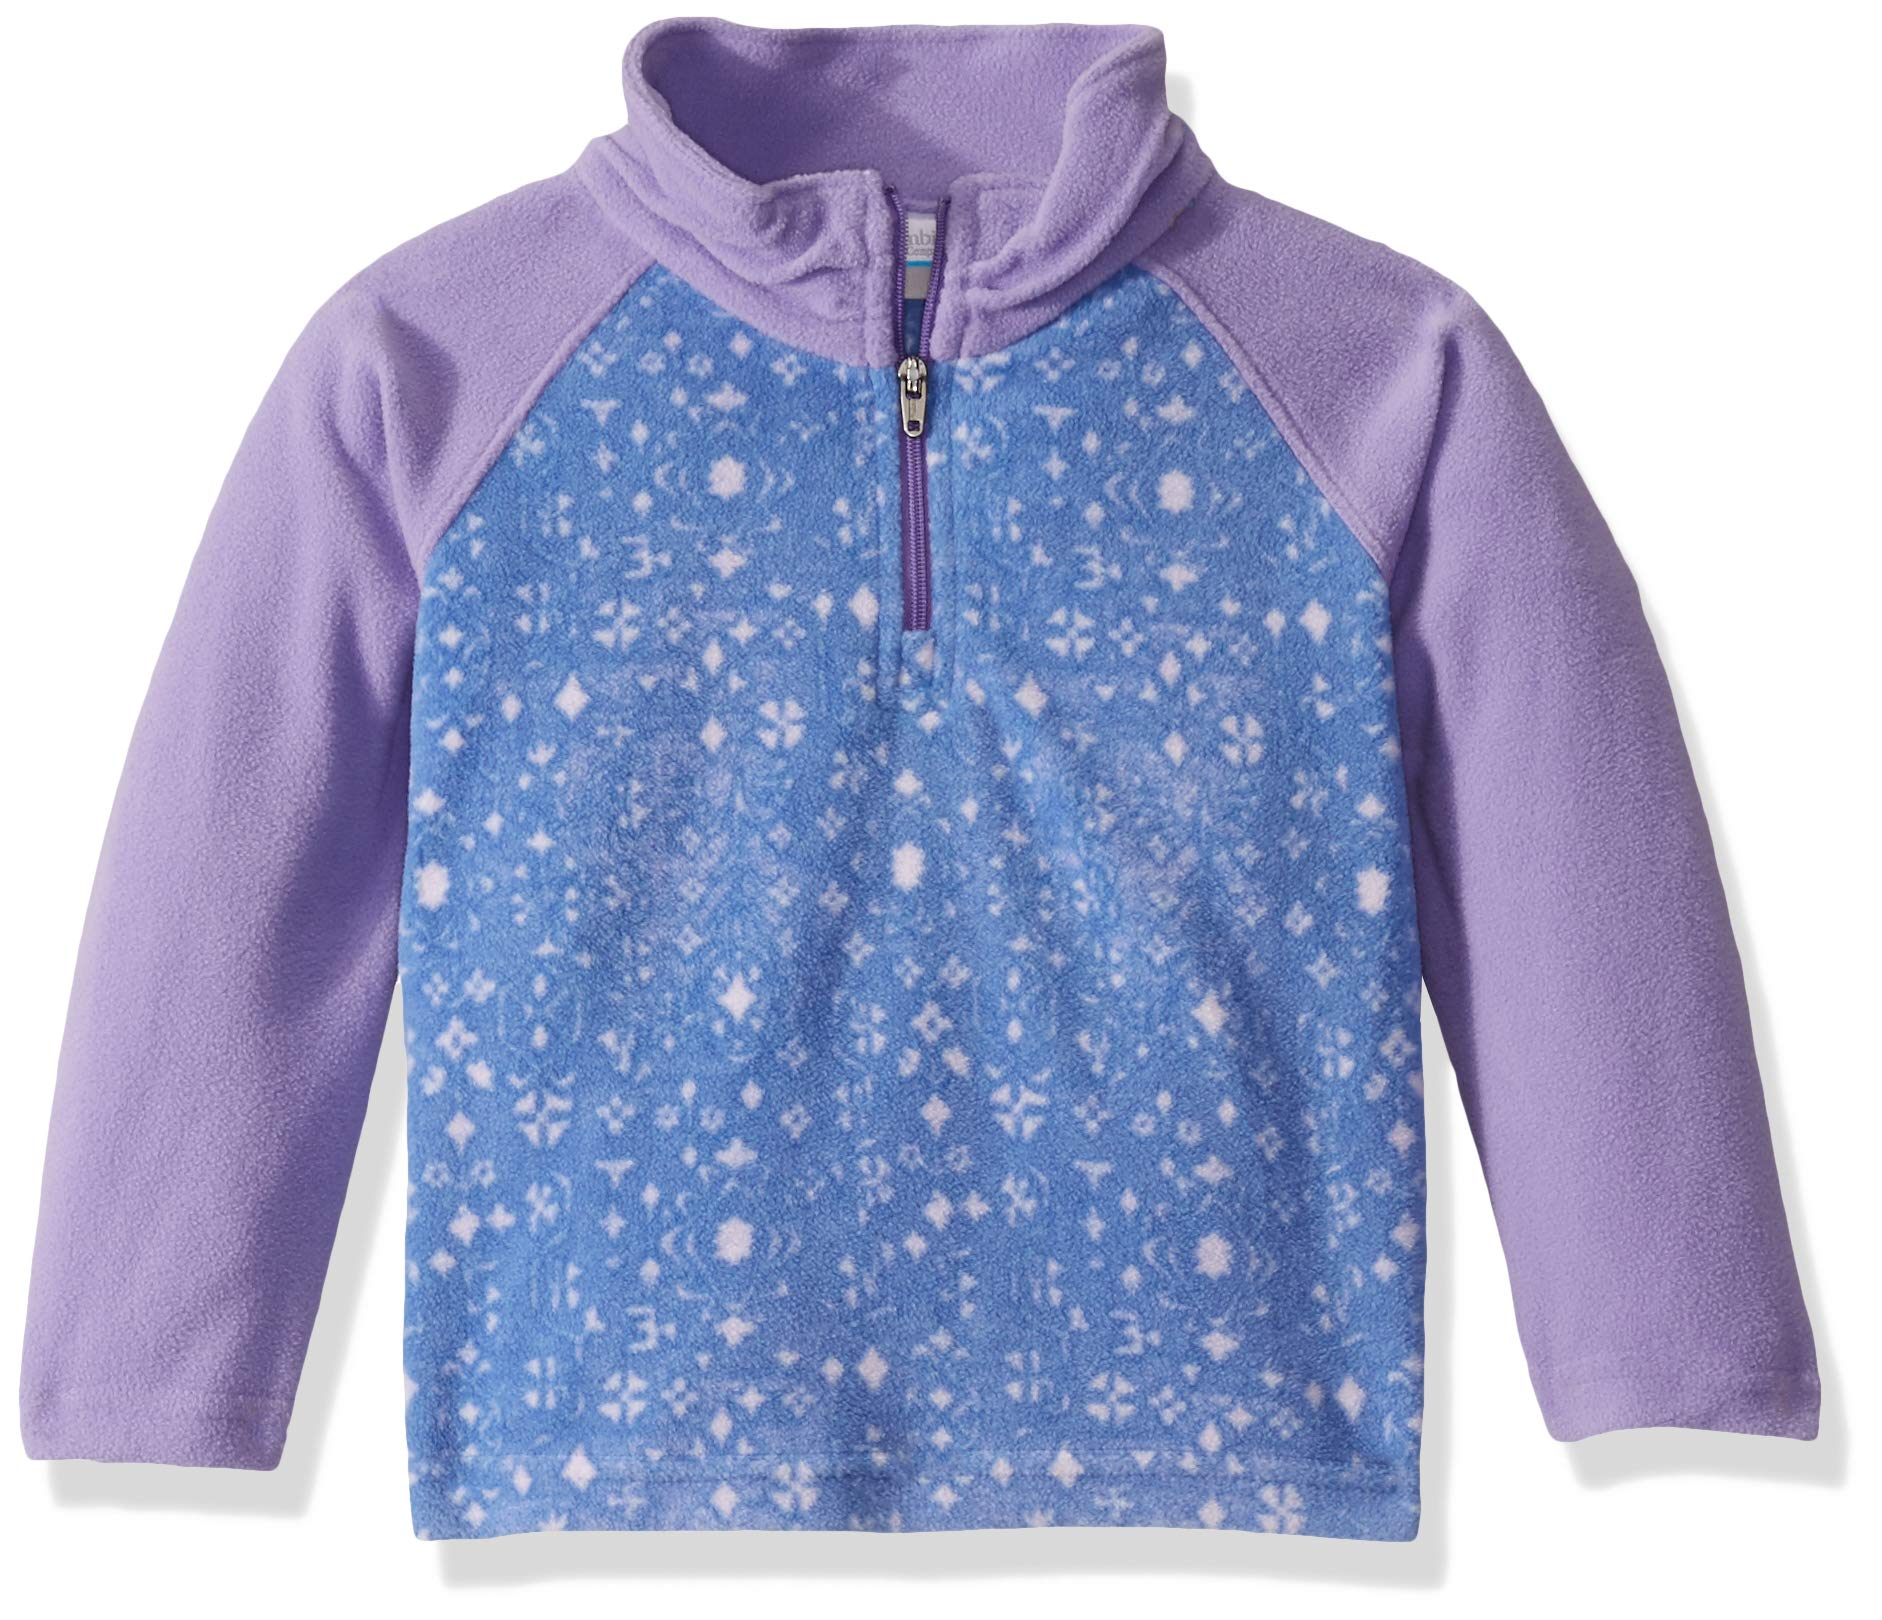 Columbia Girls' Big Glacial II Fleece Print Half Zip, Floral/Paisley Purple, Large by Columbia